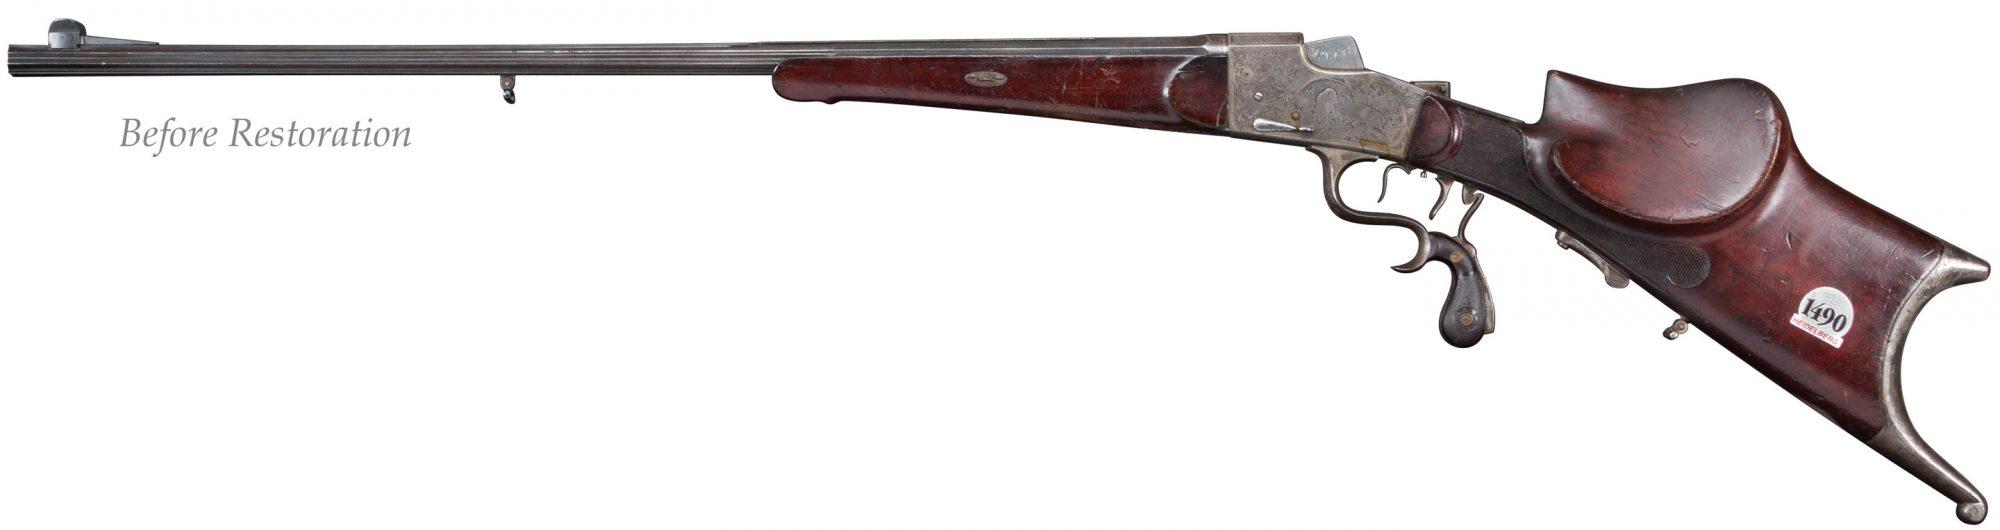 German gun, originally manufactured in the 1920s, before restoration by Turnbull Restoration